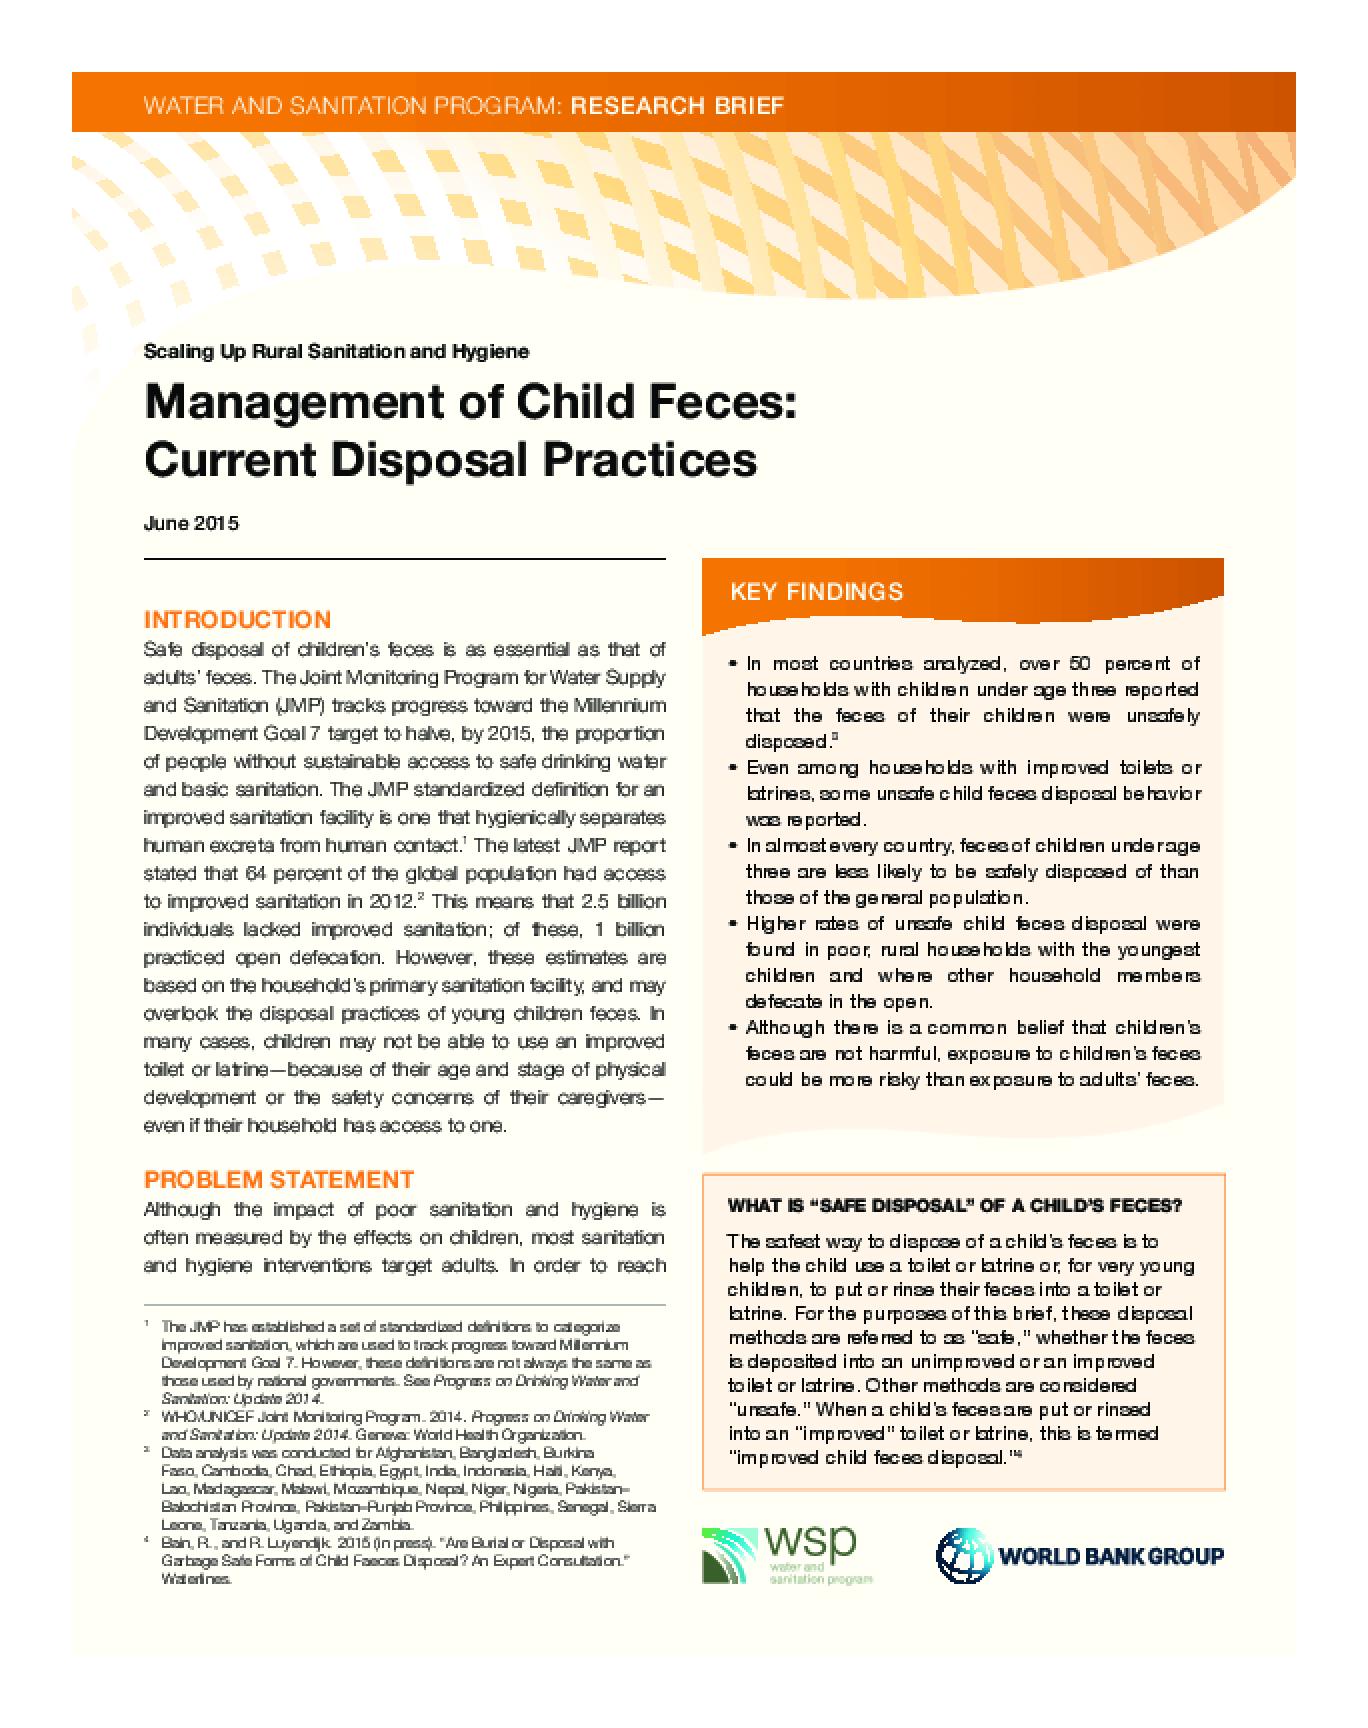 Management of Child Feces: Current Disposal Practices